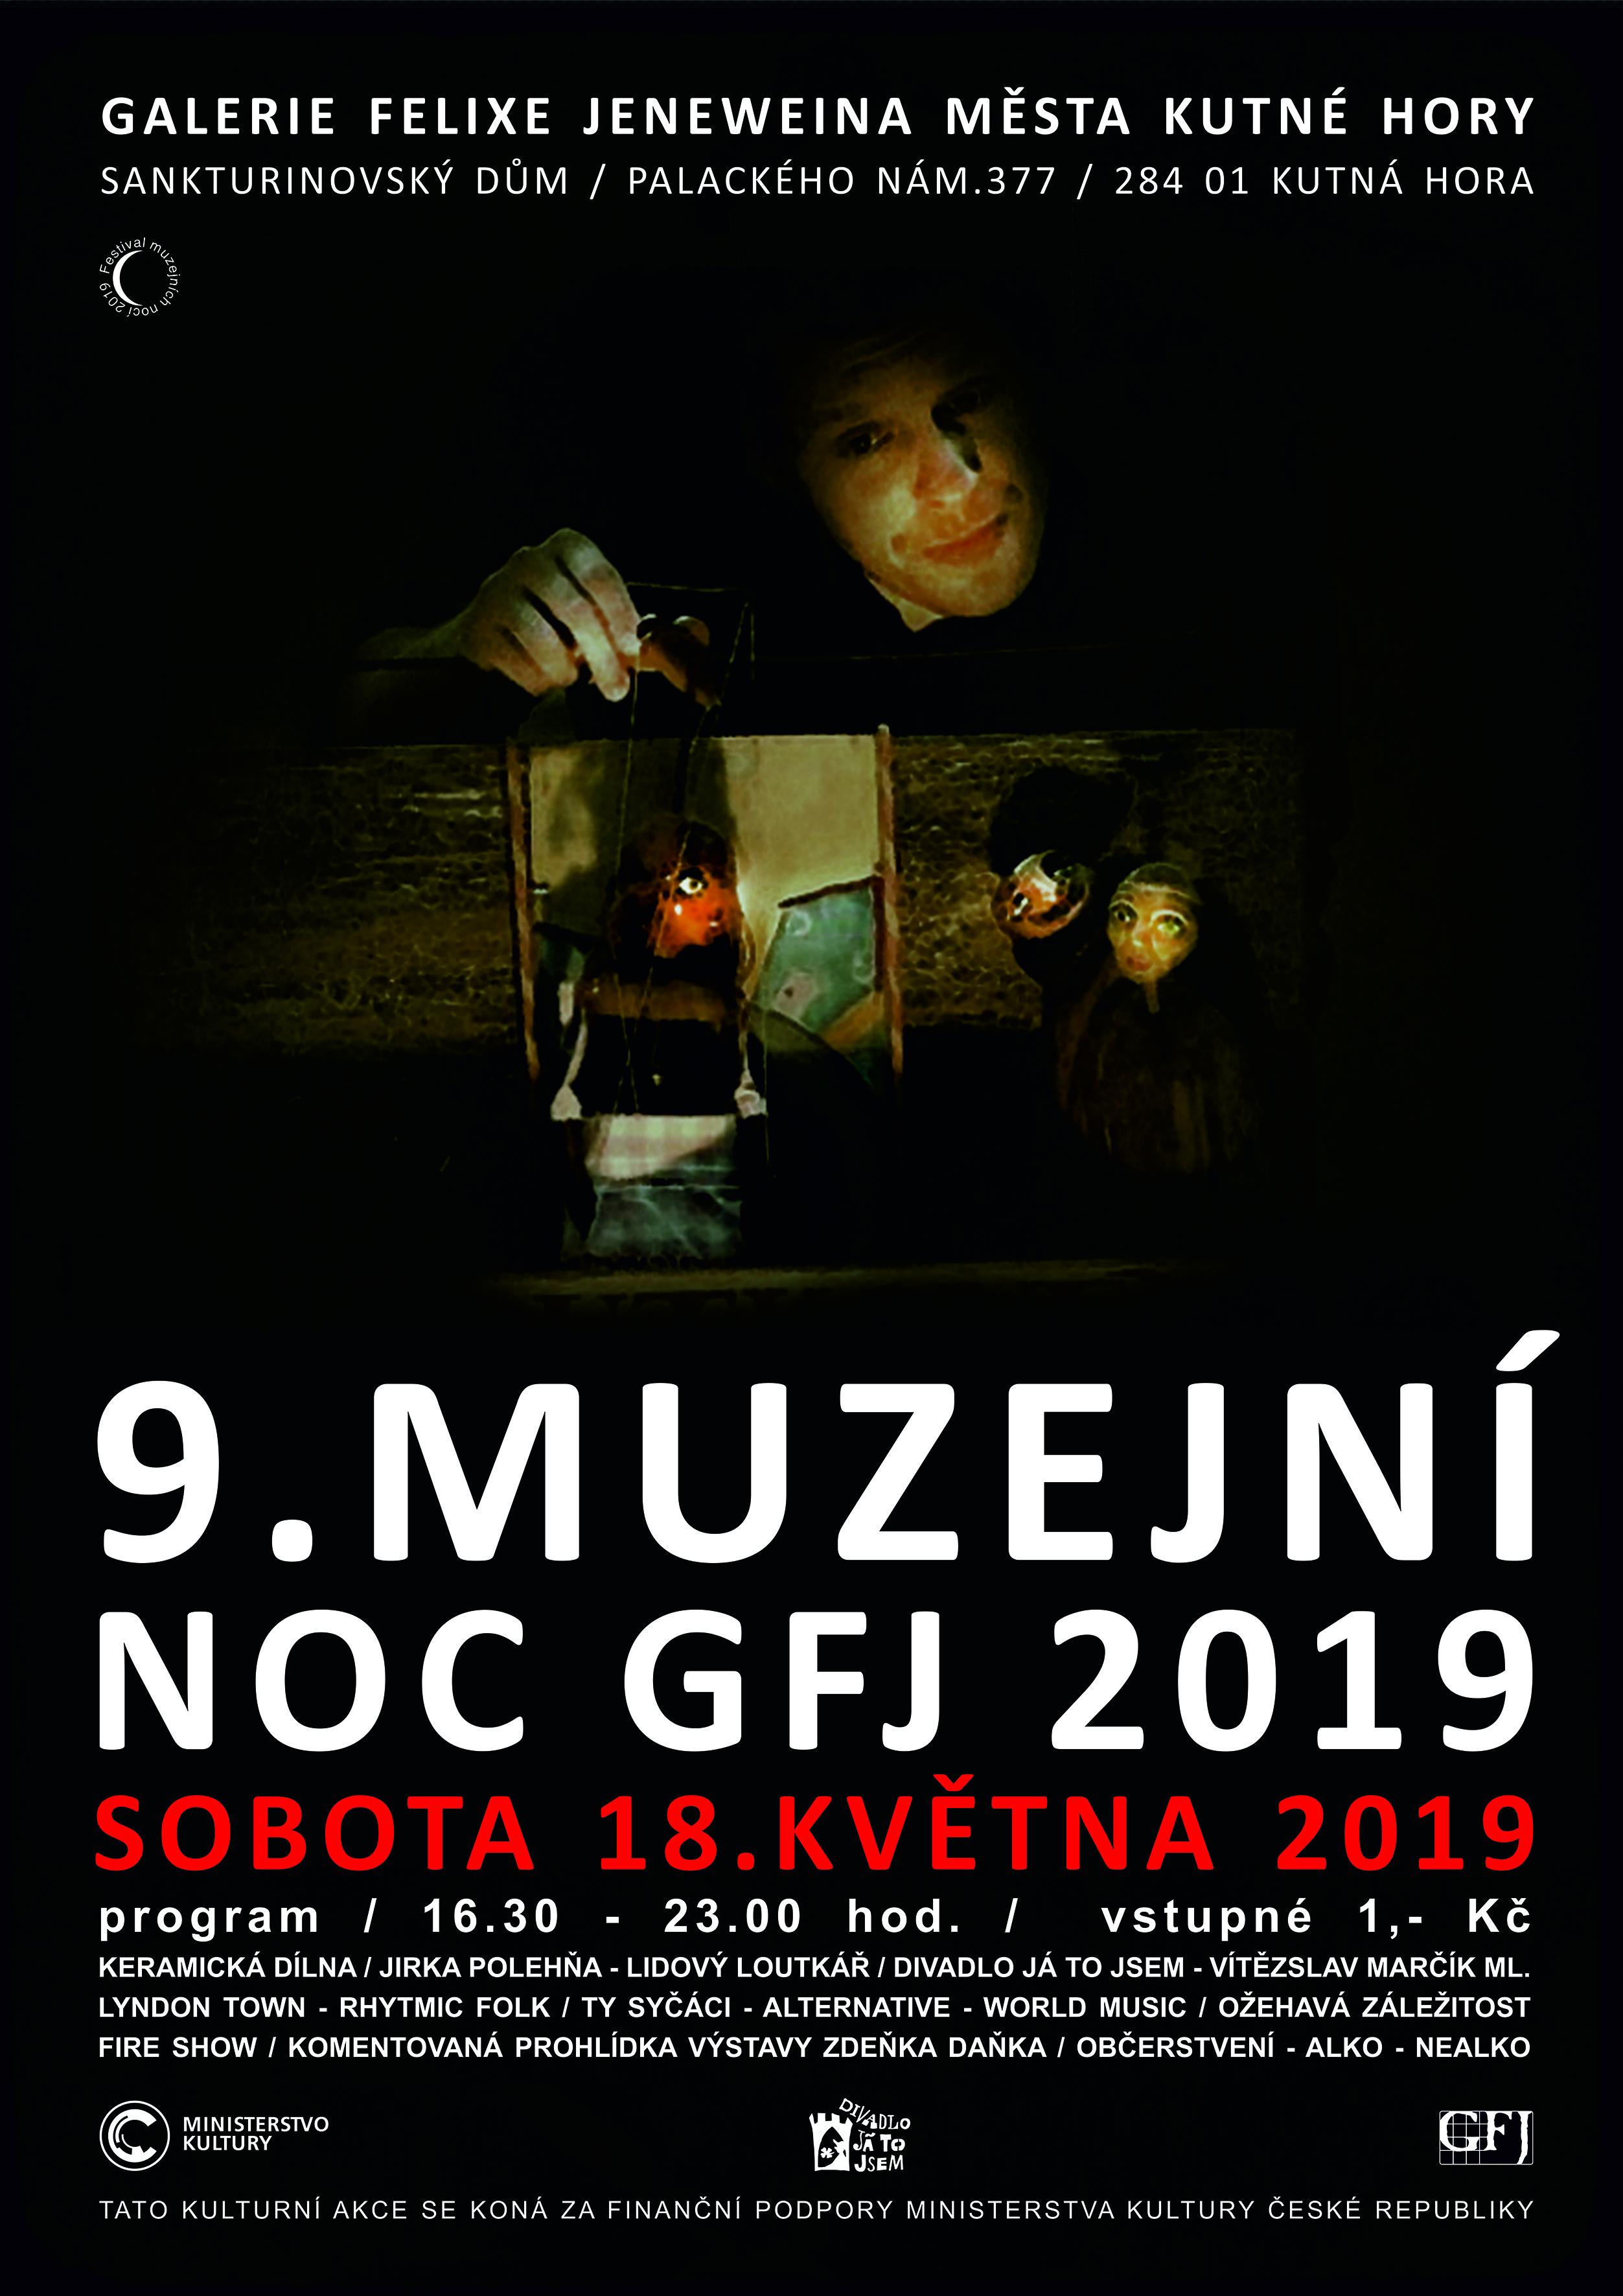 5114-muzejni-noc-2019-new-web.jpg